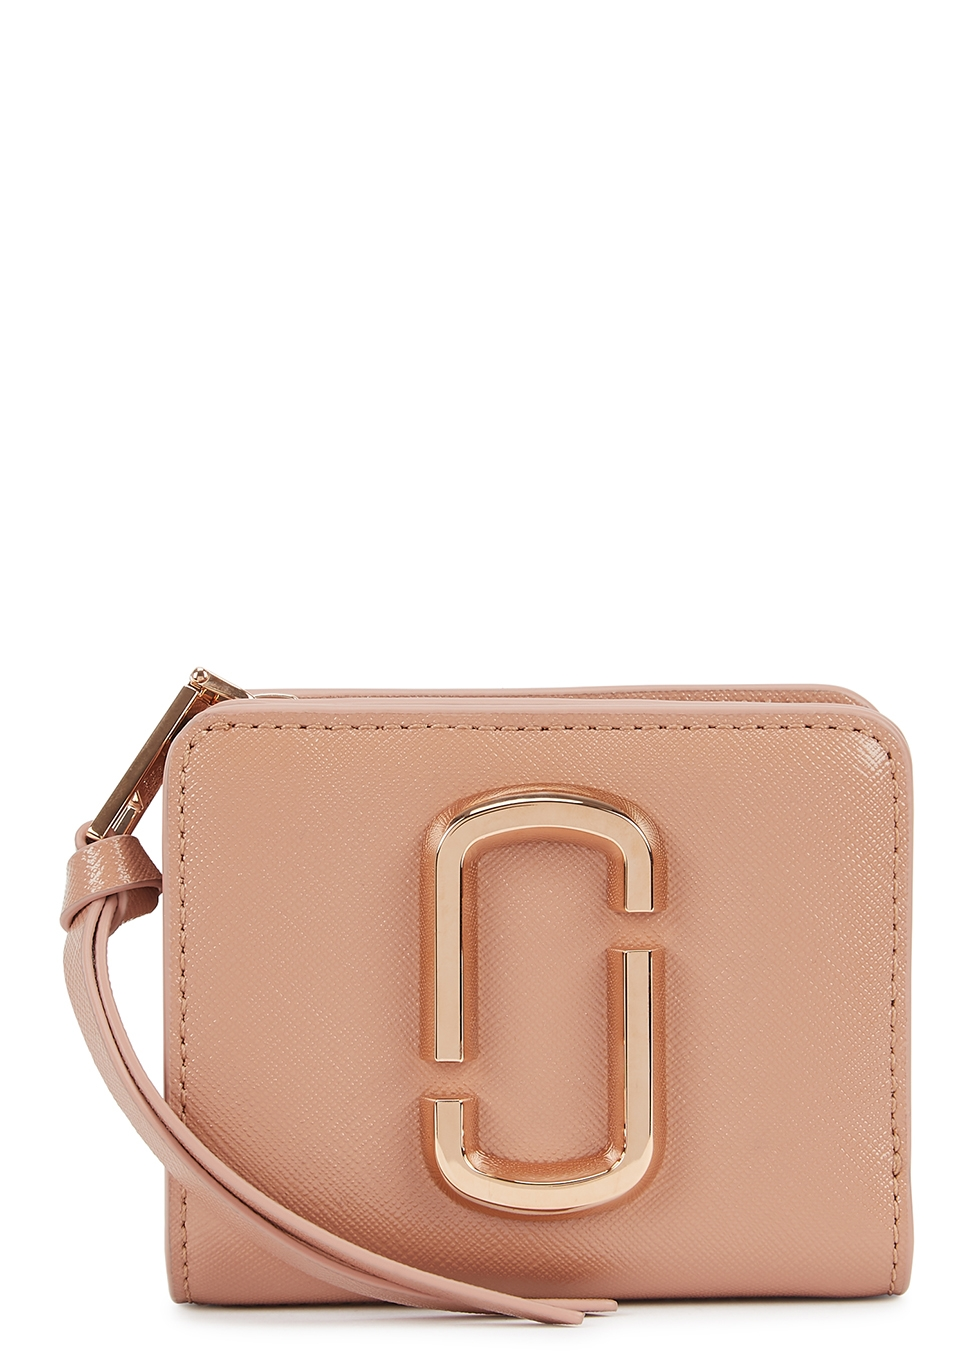 Snapshot pink leather wallet